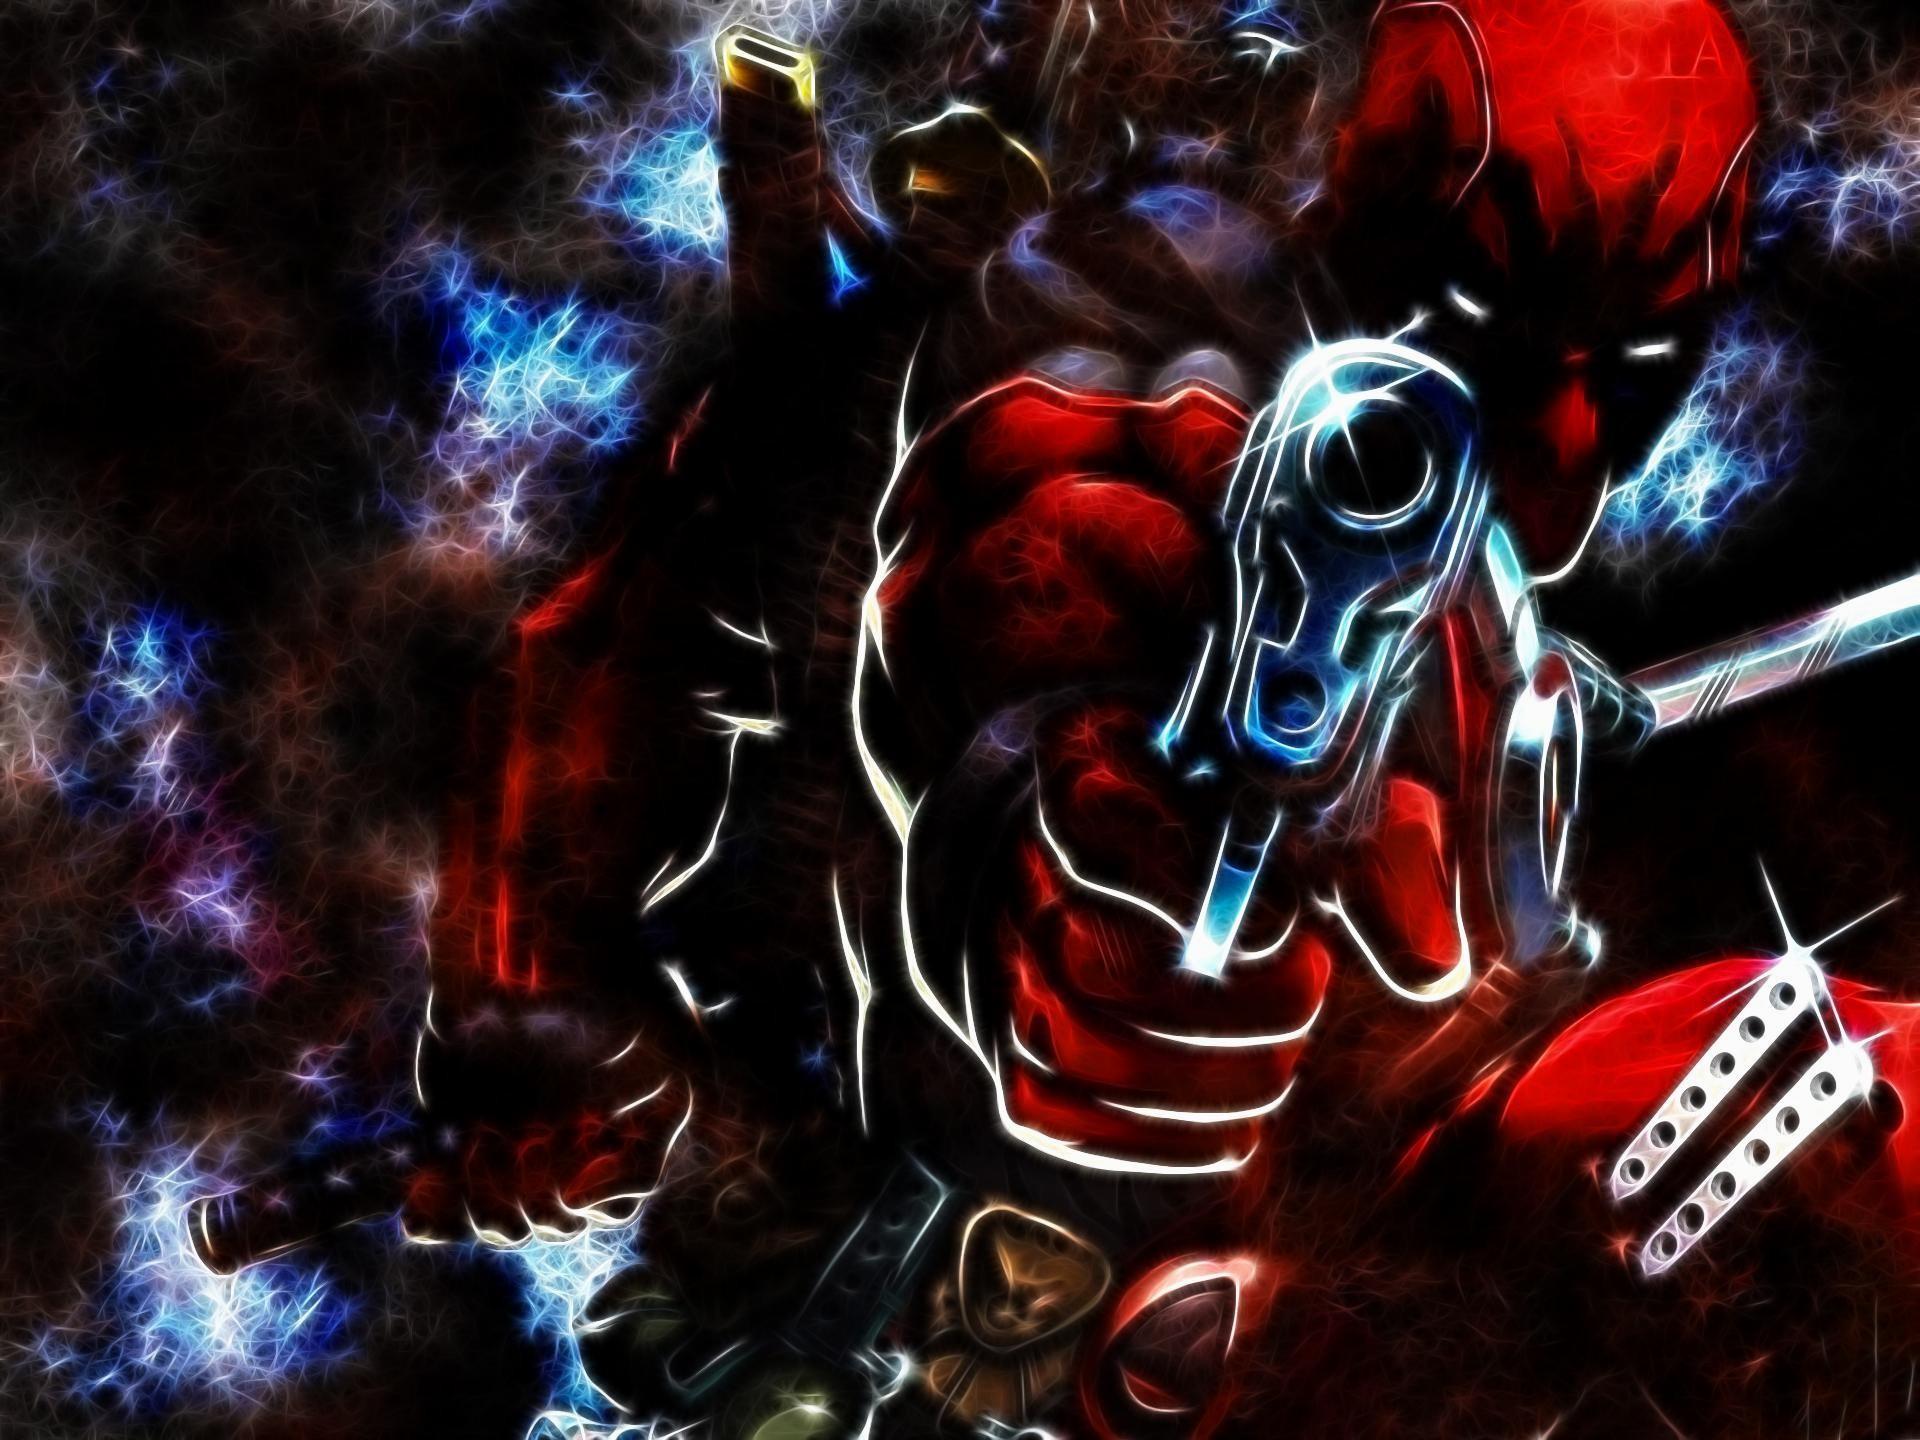 wallpaper.wiki-Funny-Deadpool-lock-screen-wallpaper-android-